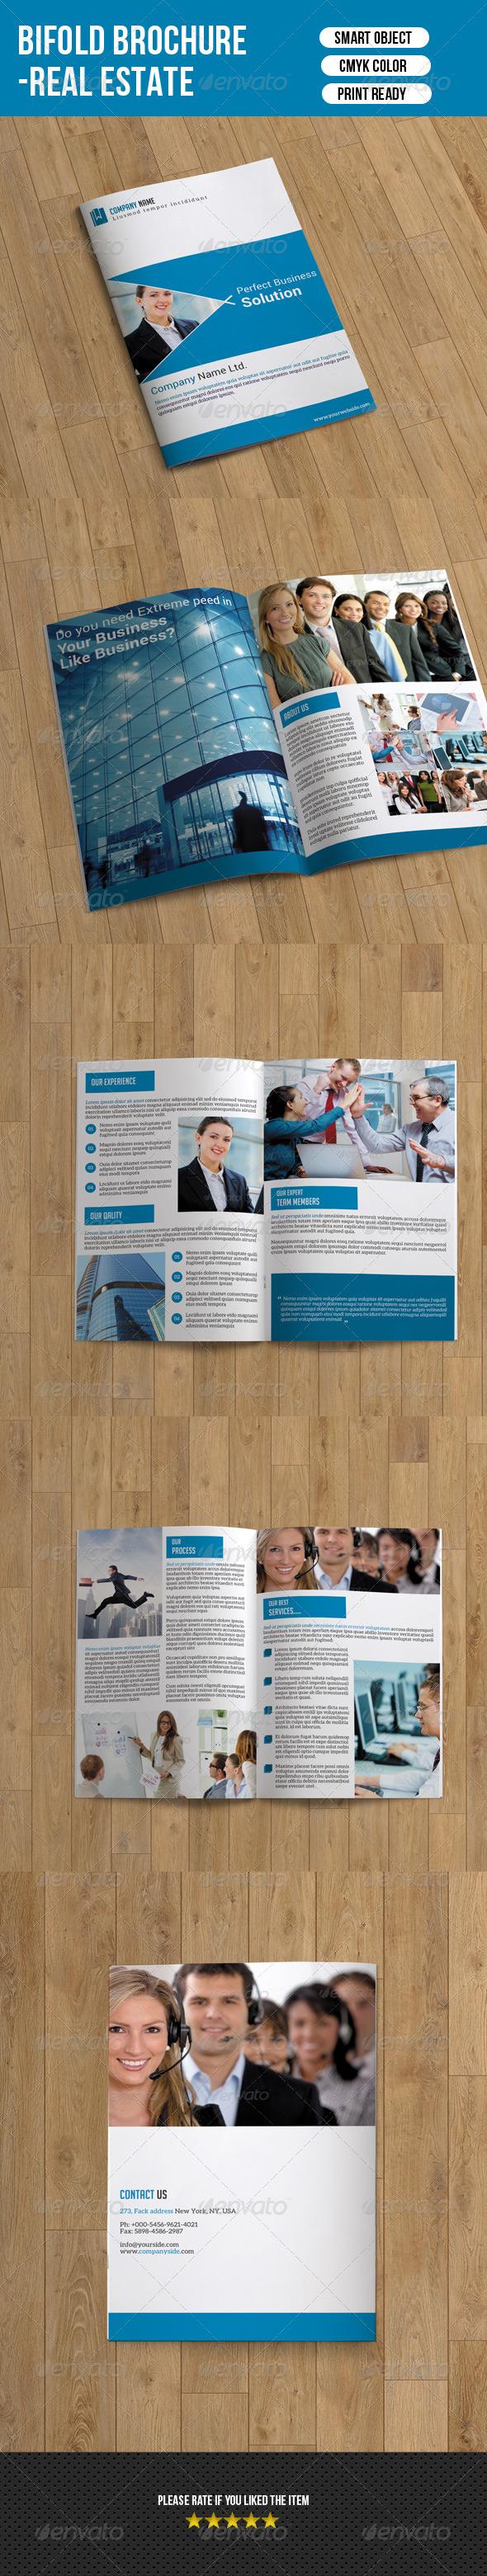 GraphicRiver Bifold Business Brochure 7374609